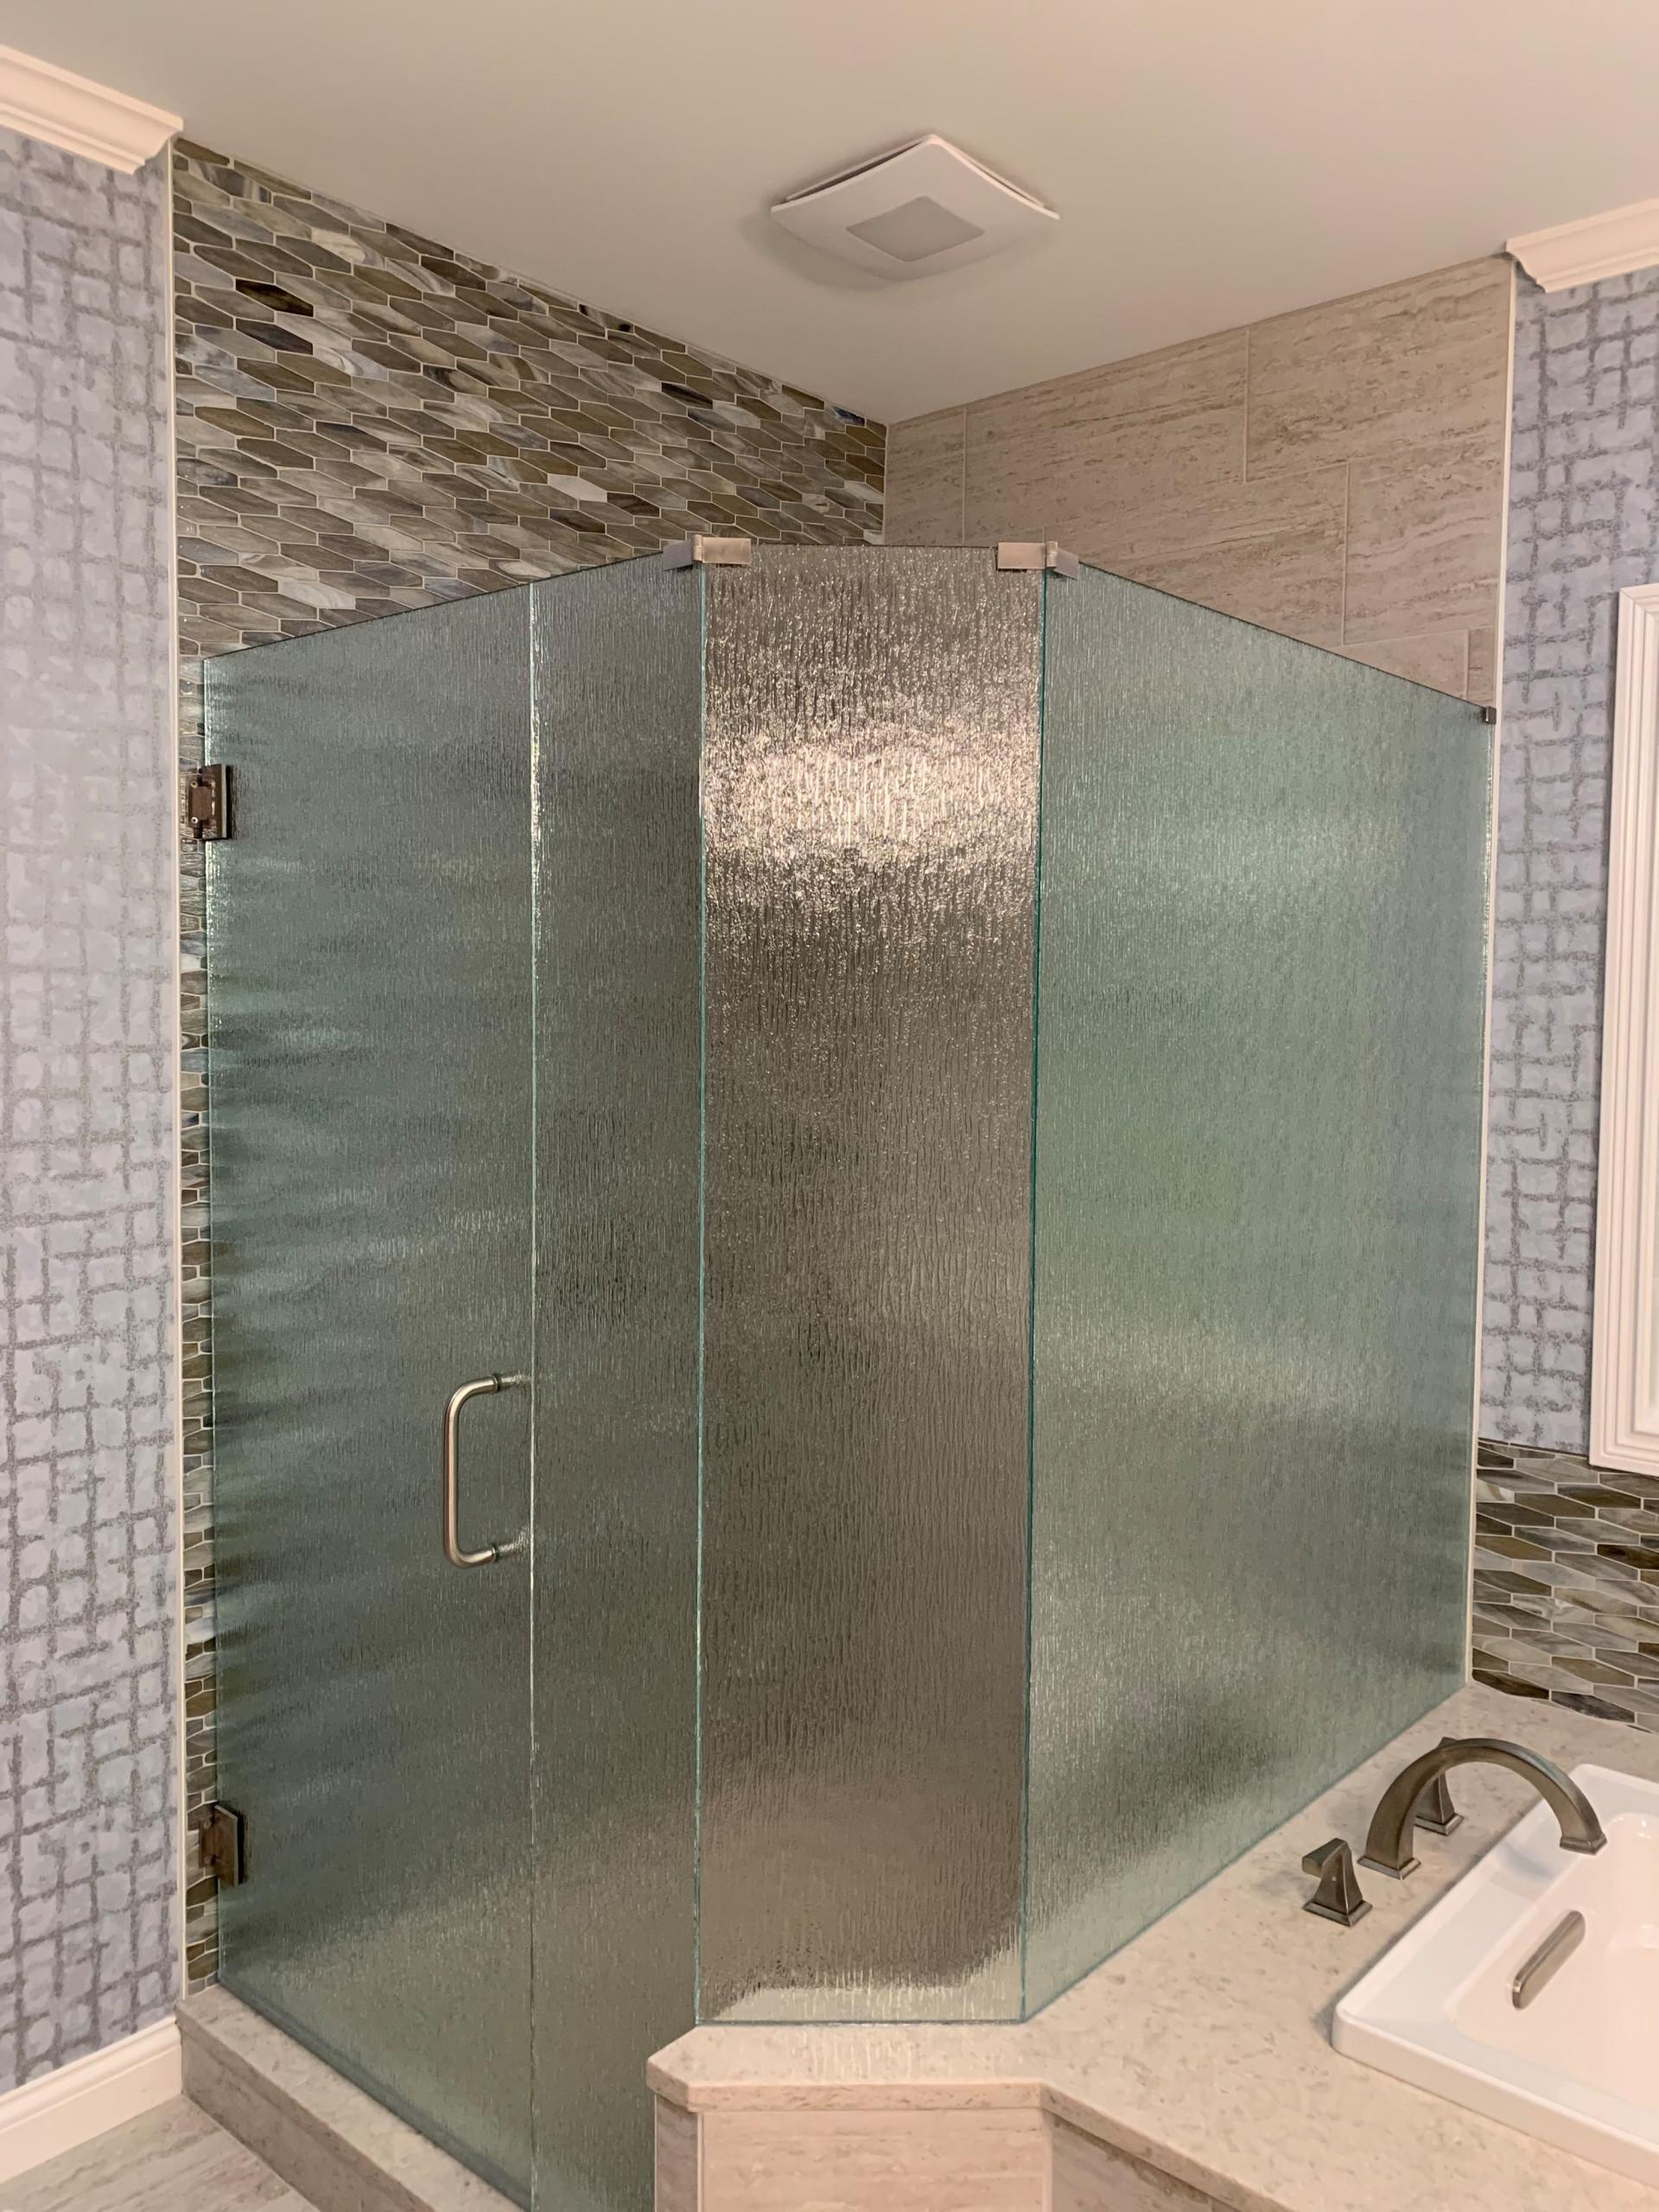 Manor master bath